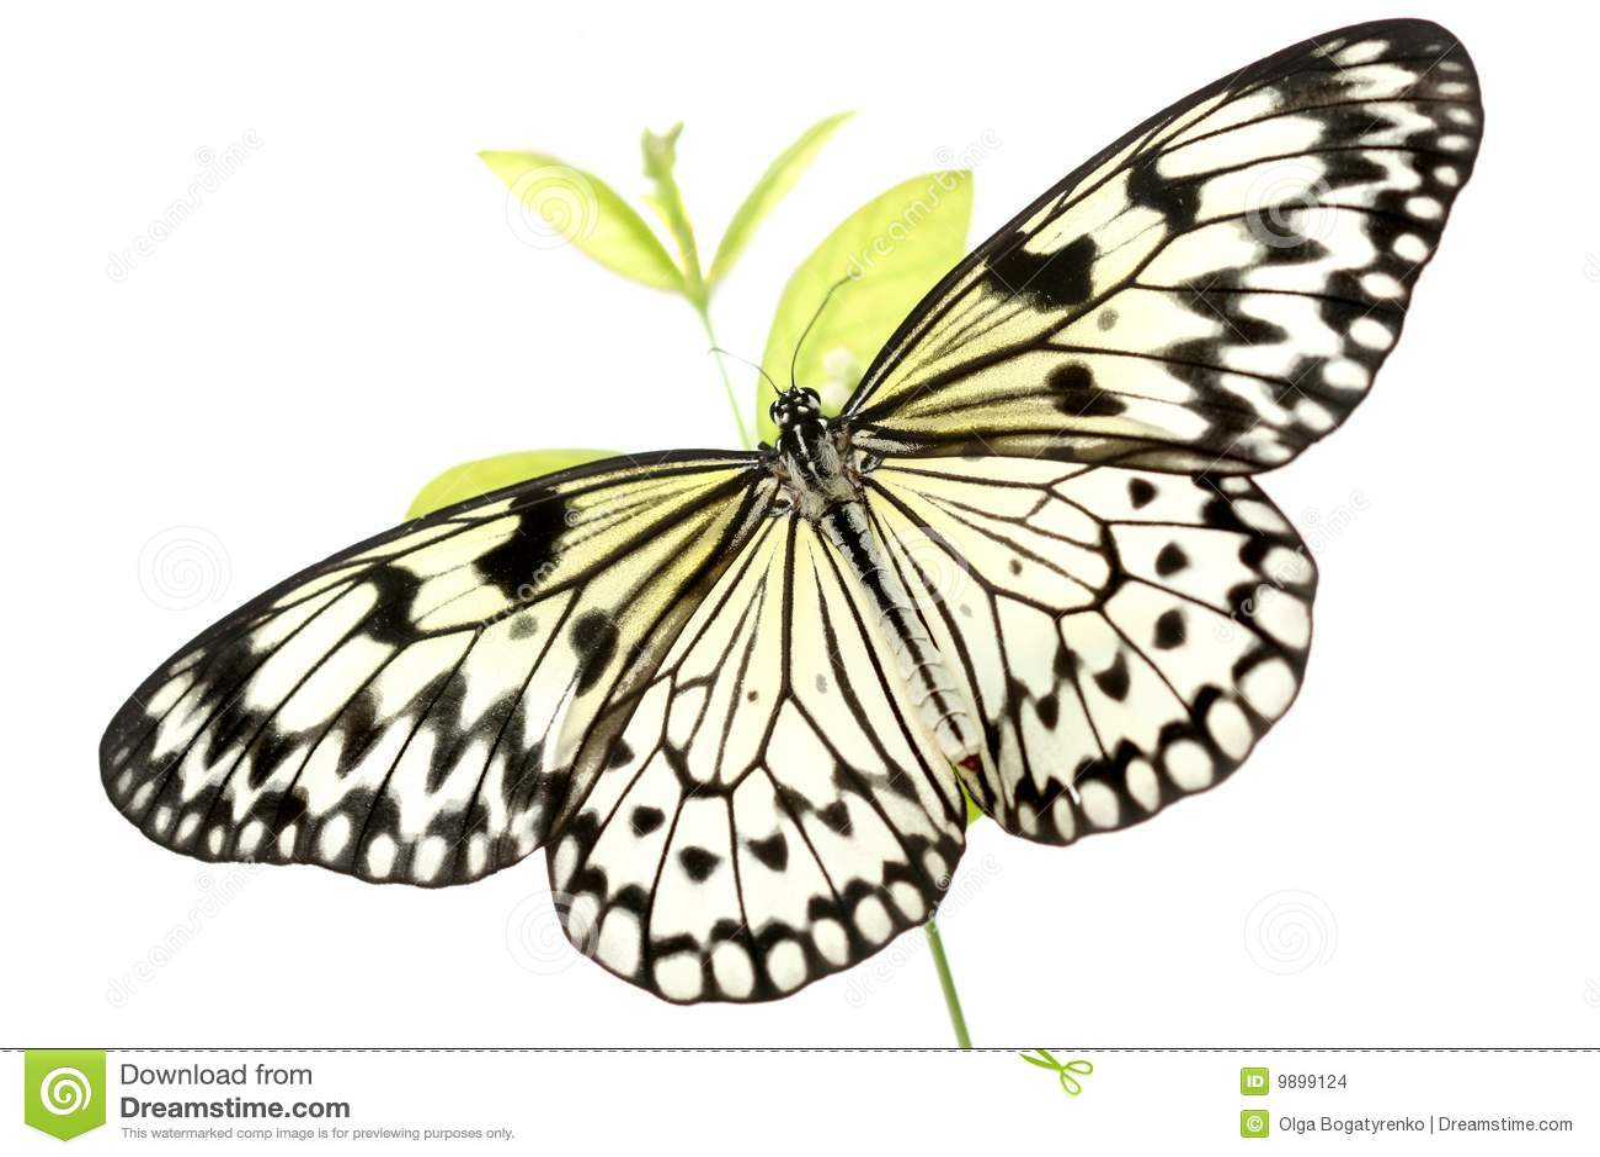 Black and white butterfly idea leuconoe on white stock for White paper butterflies